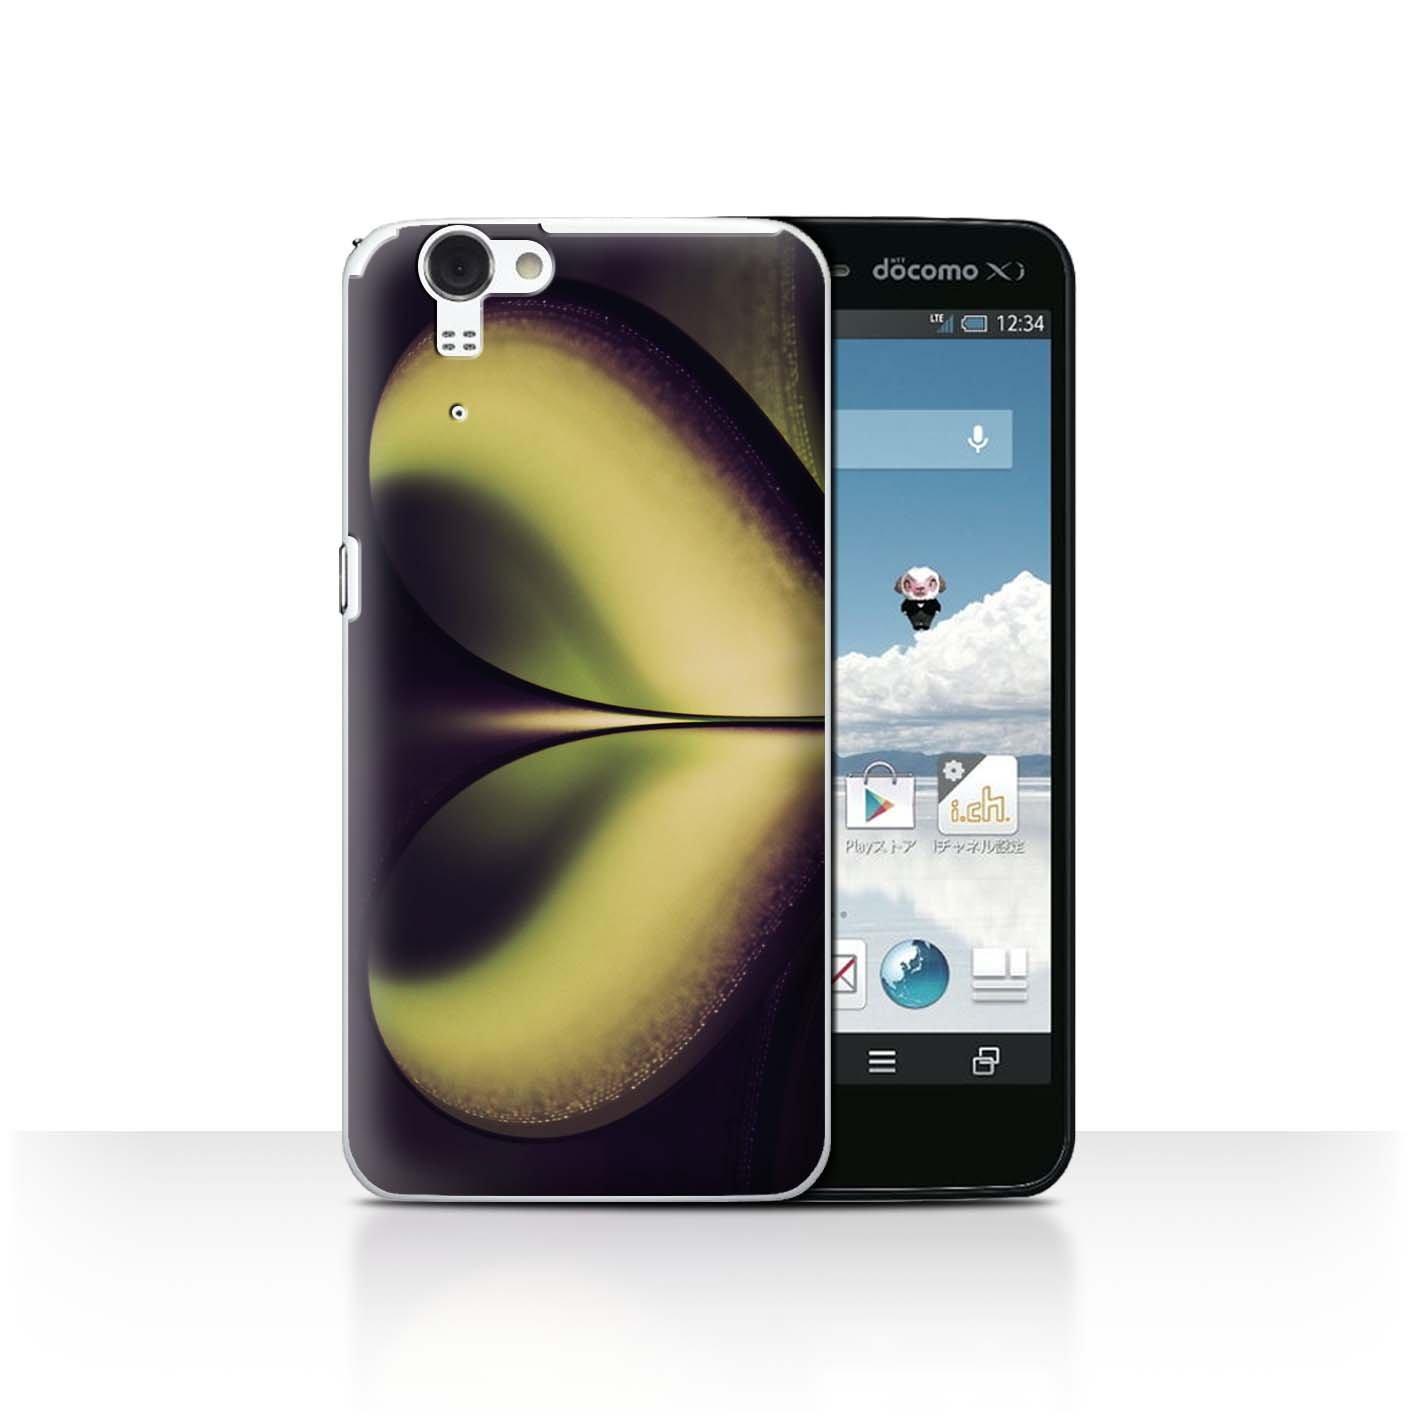 STUFF4 Phone Case / Cover for Sharp Aquos Zeta SH-01F/Docomo